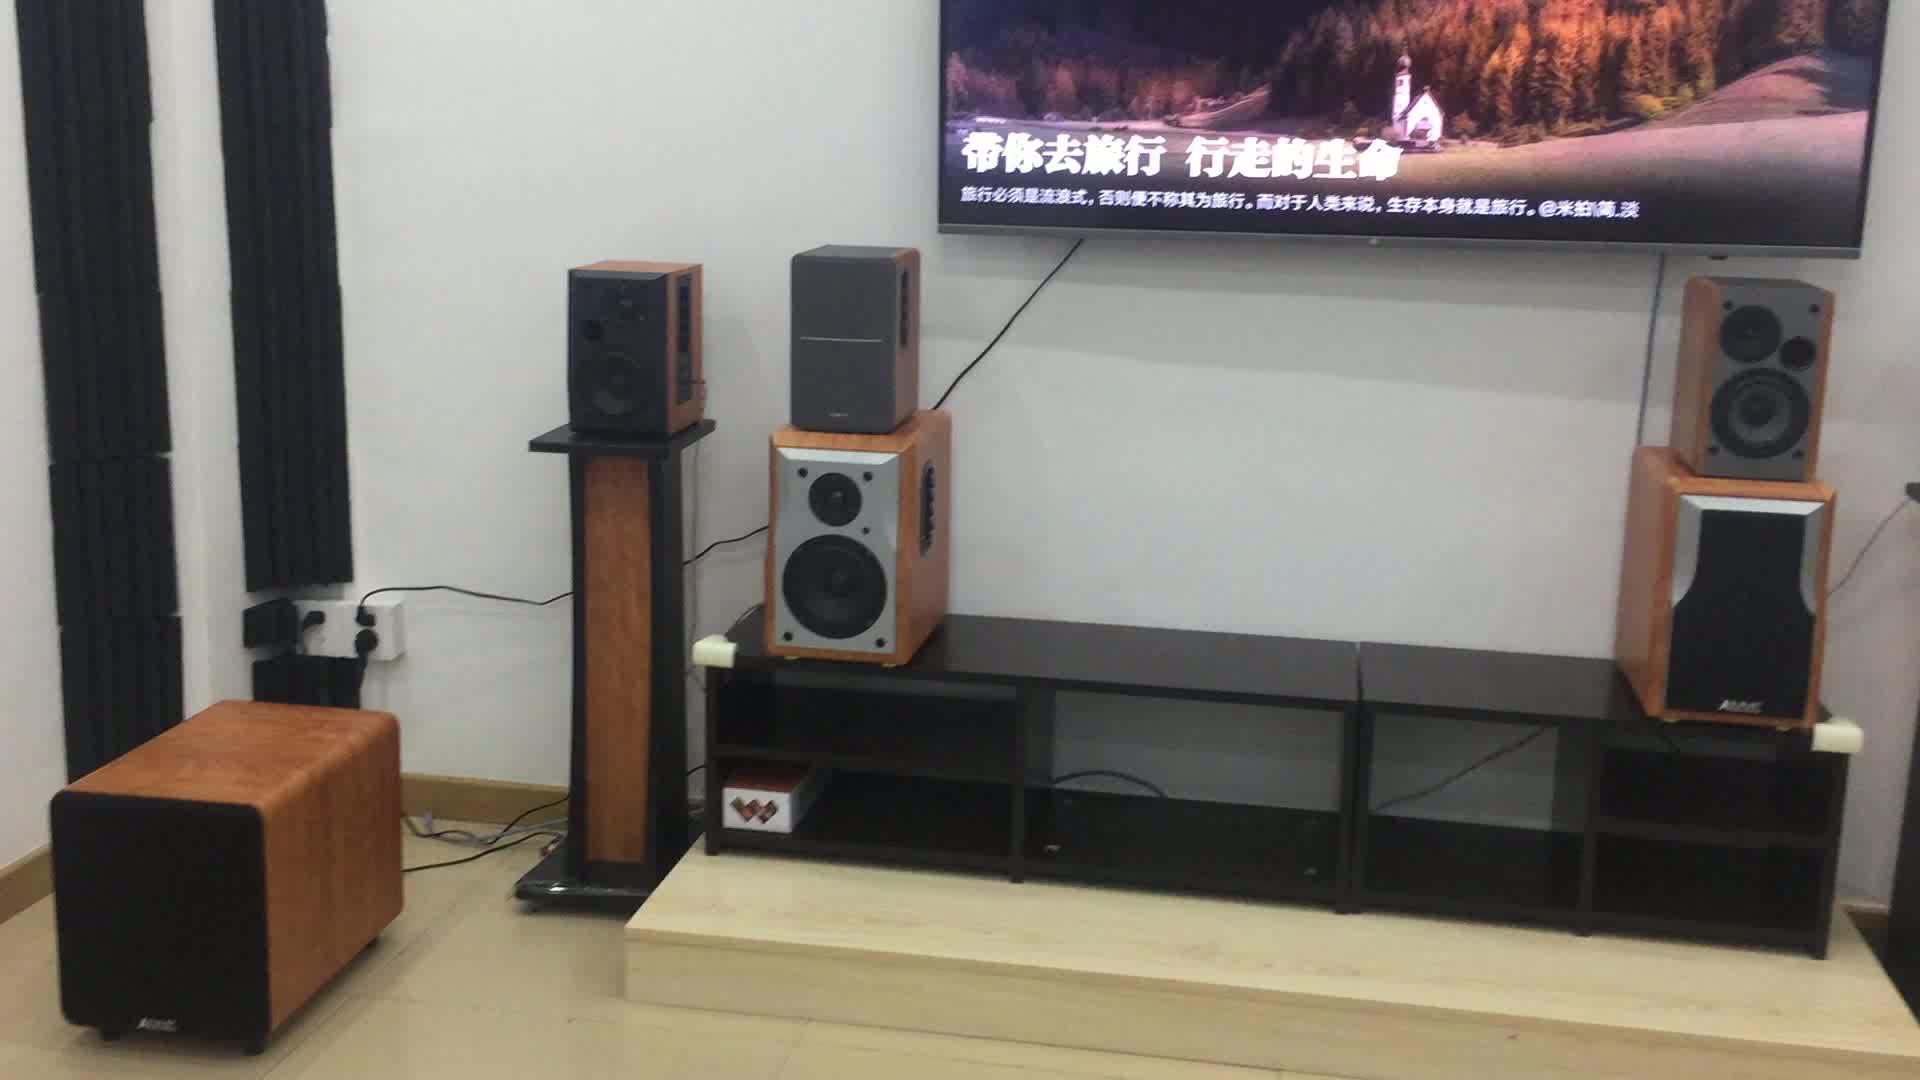 2019 Baru Kayu Super Bass DVD USB SD MMC Kartu Nirkabel 2ch Stereo Suara 50W RMS Hi-fi Gigi Biru rak Buku HI FI Speaker